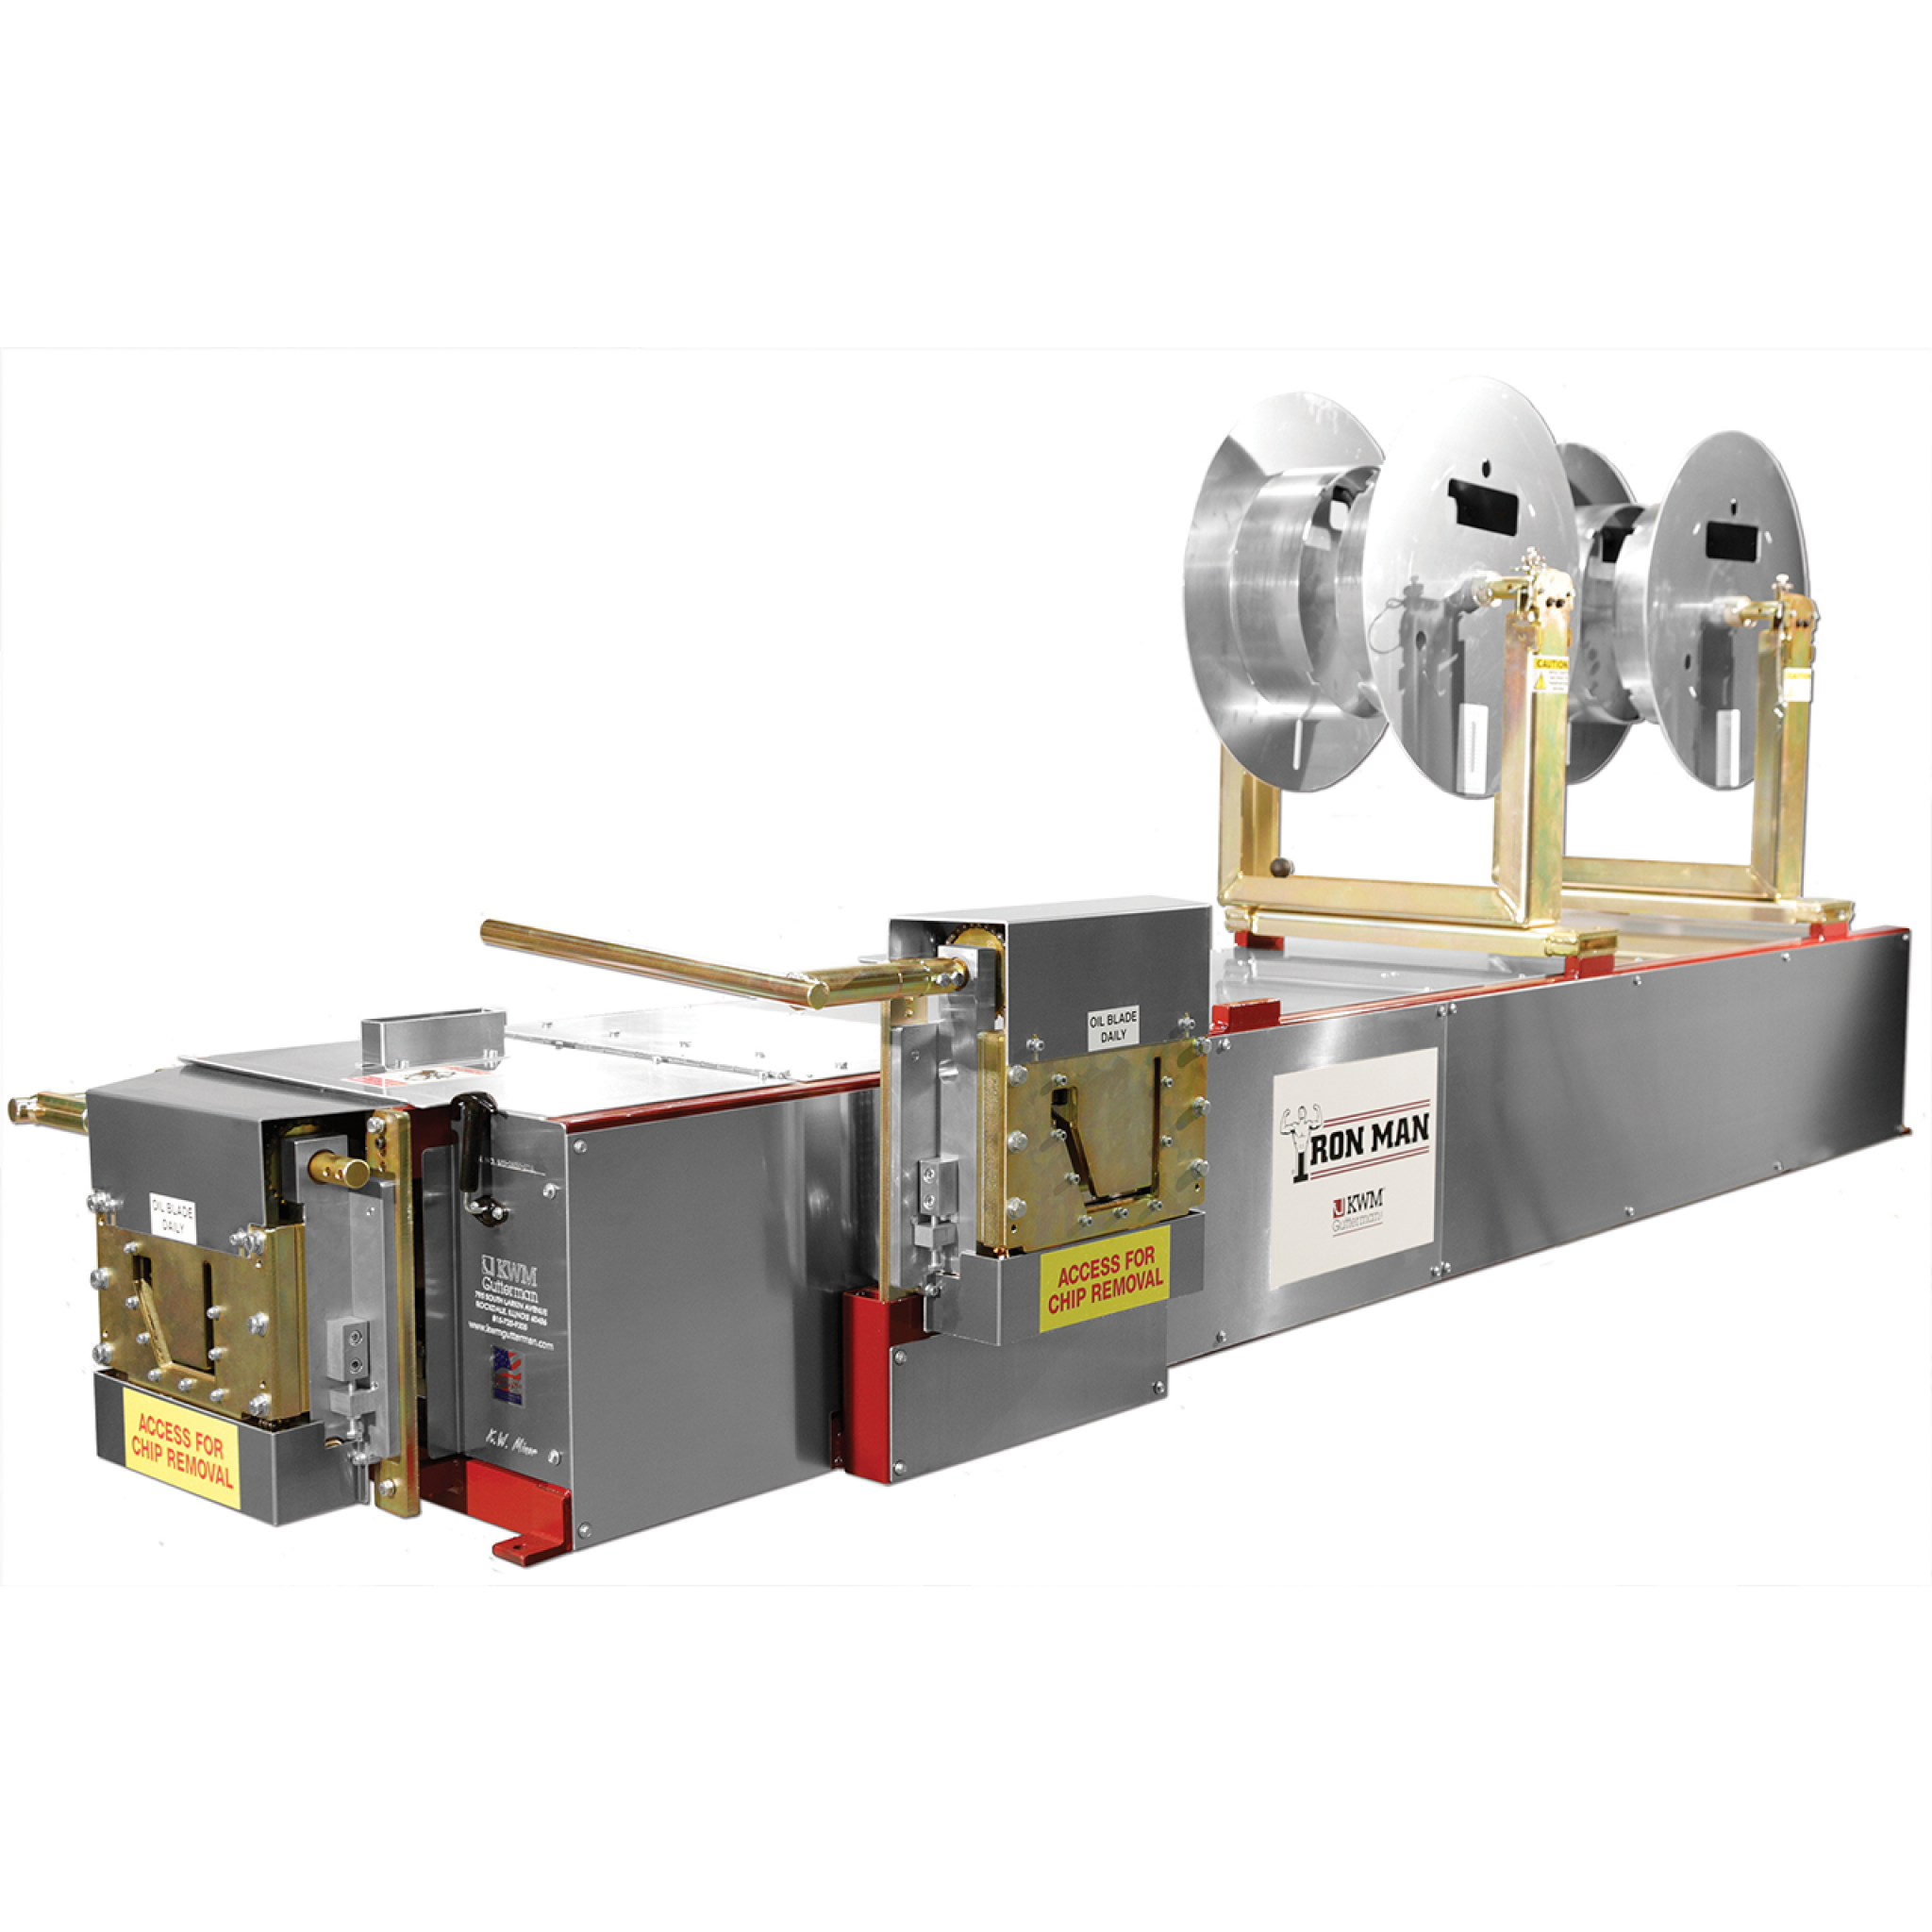 "5""/6"" IronMan Combo Gutter Machine"